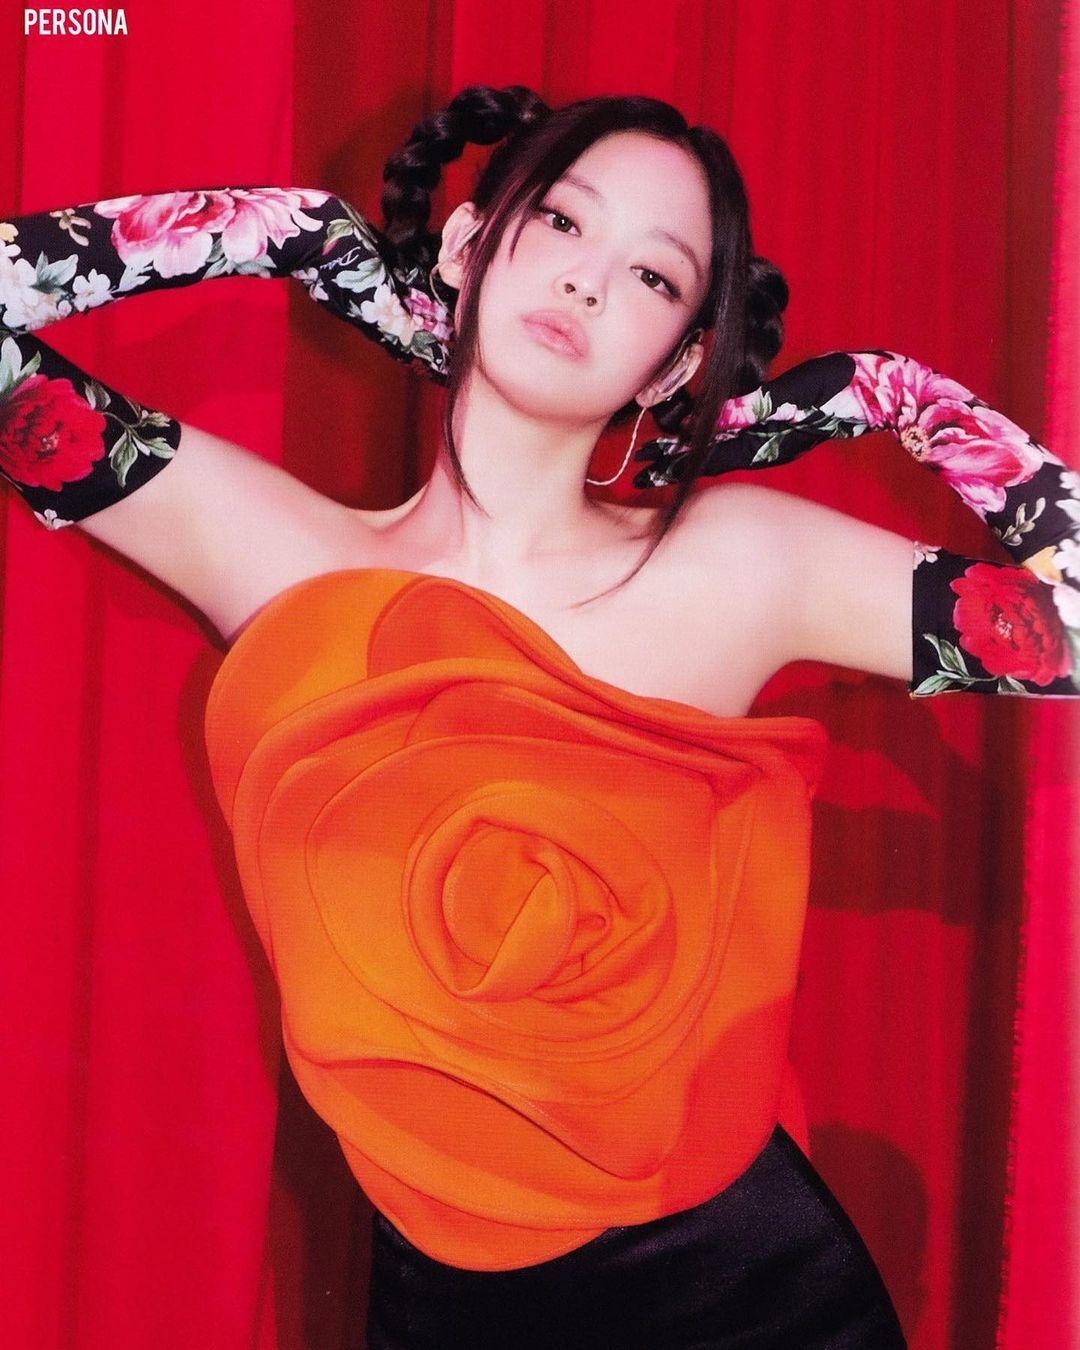 Blackpink Jennie's 'SOLO' streams 300 million on Spotify... First Korean solo